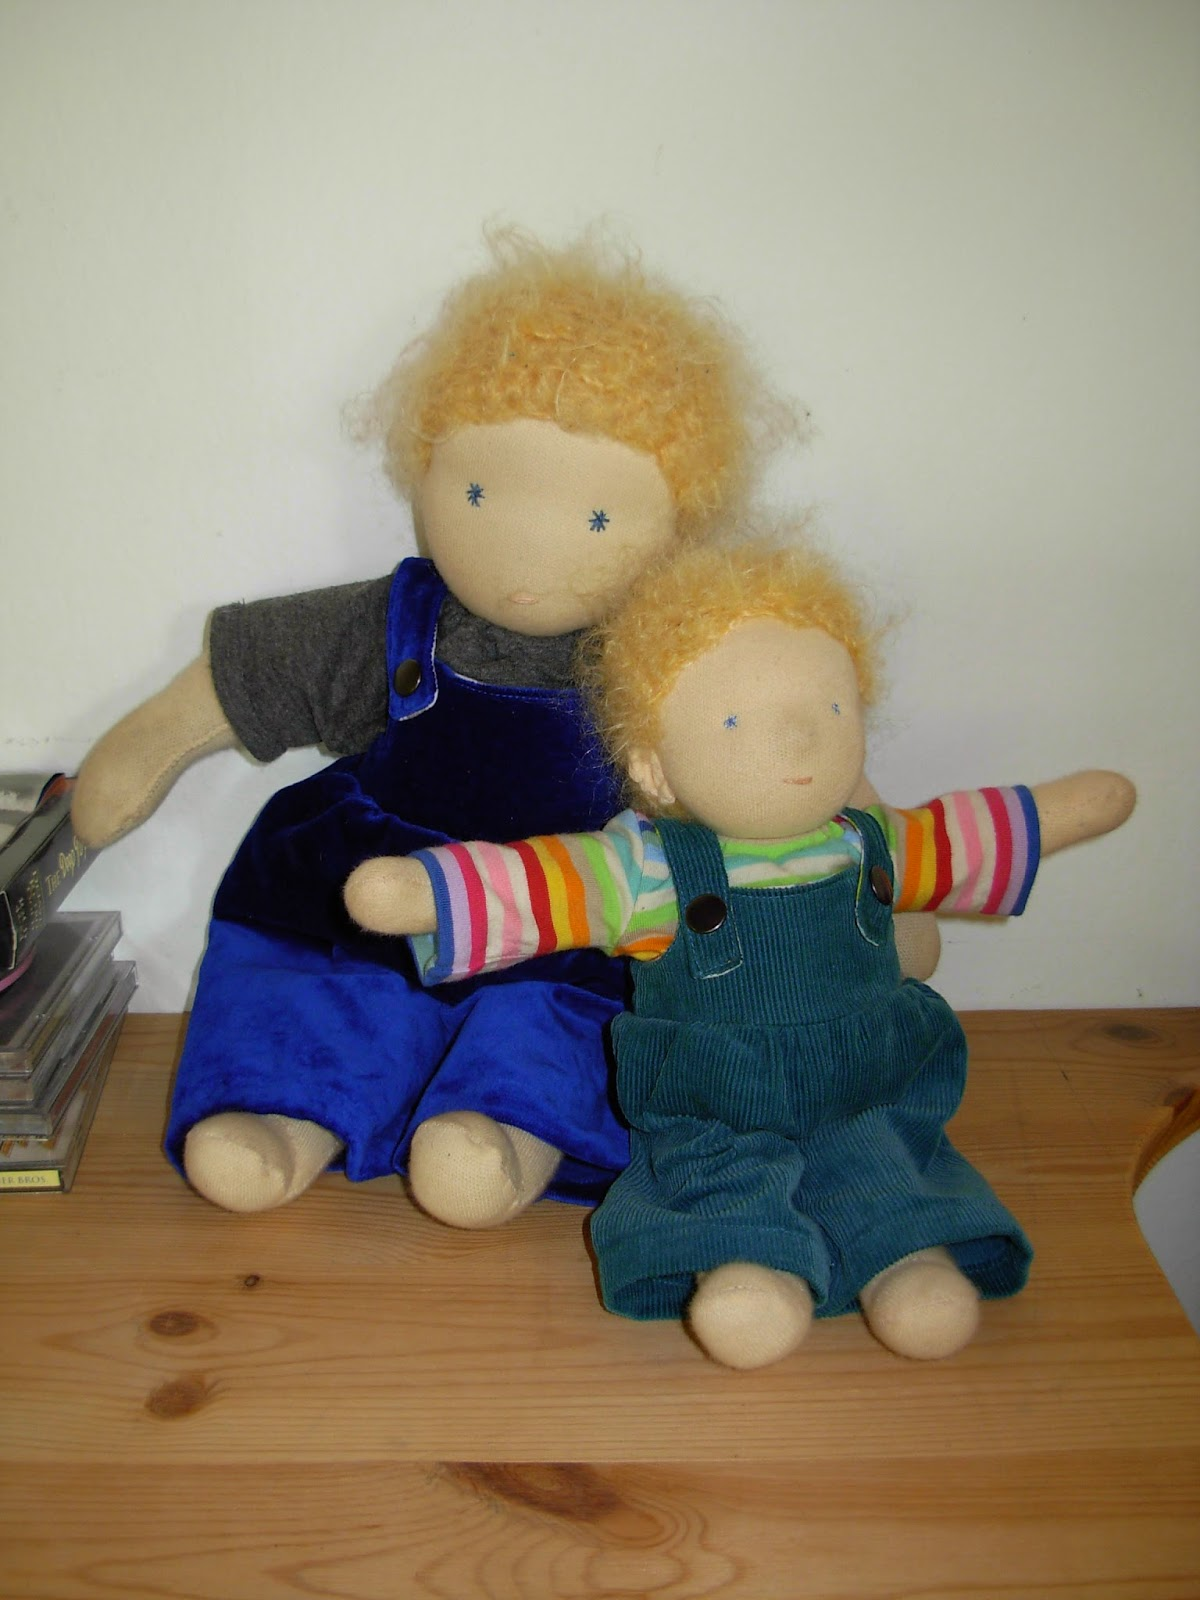 Puppen für Jungen selbst genäht